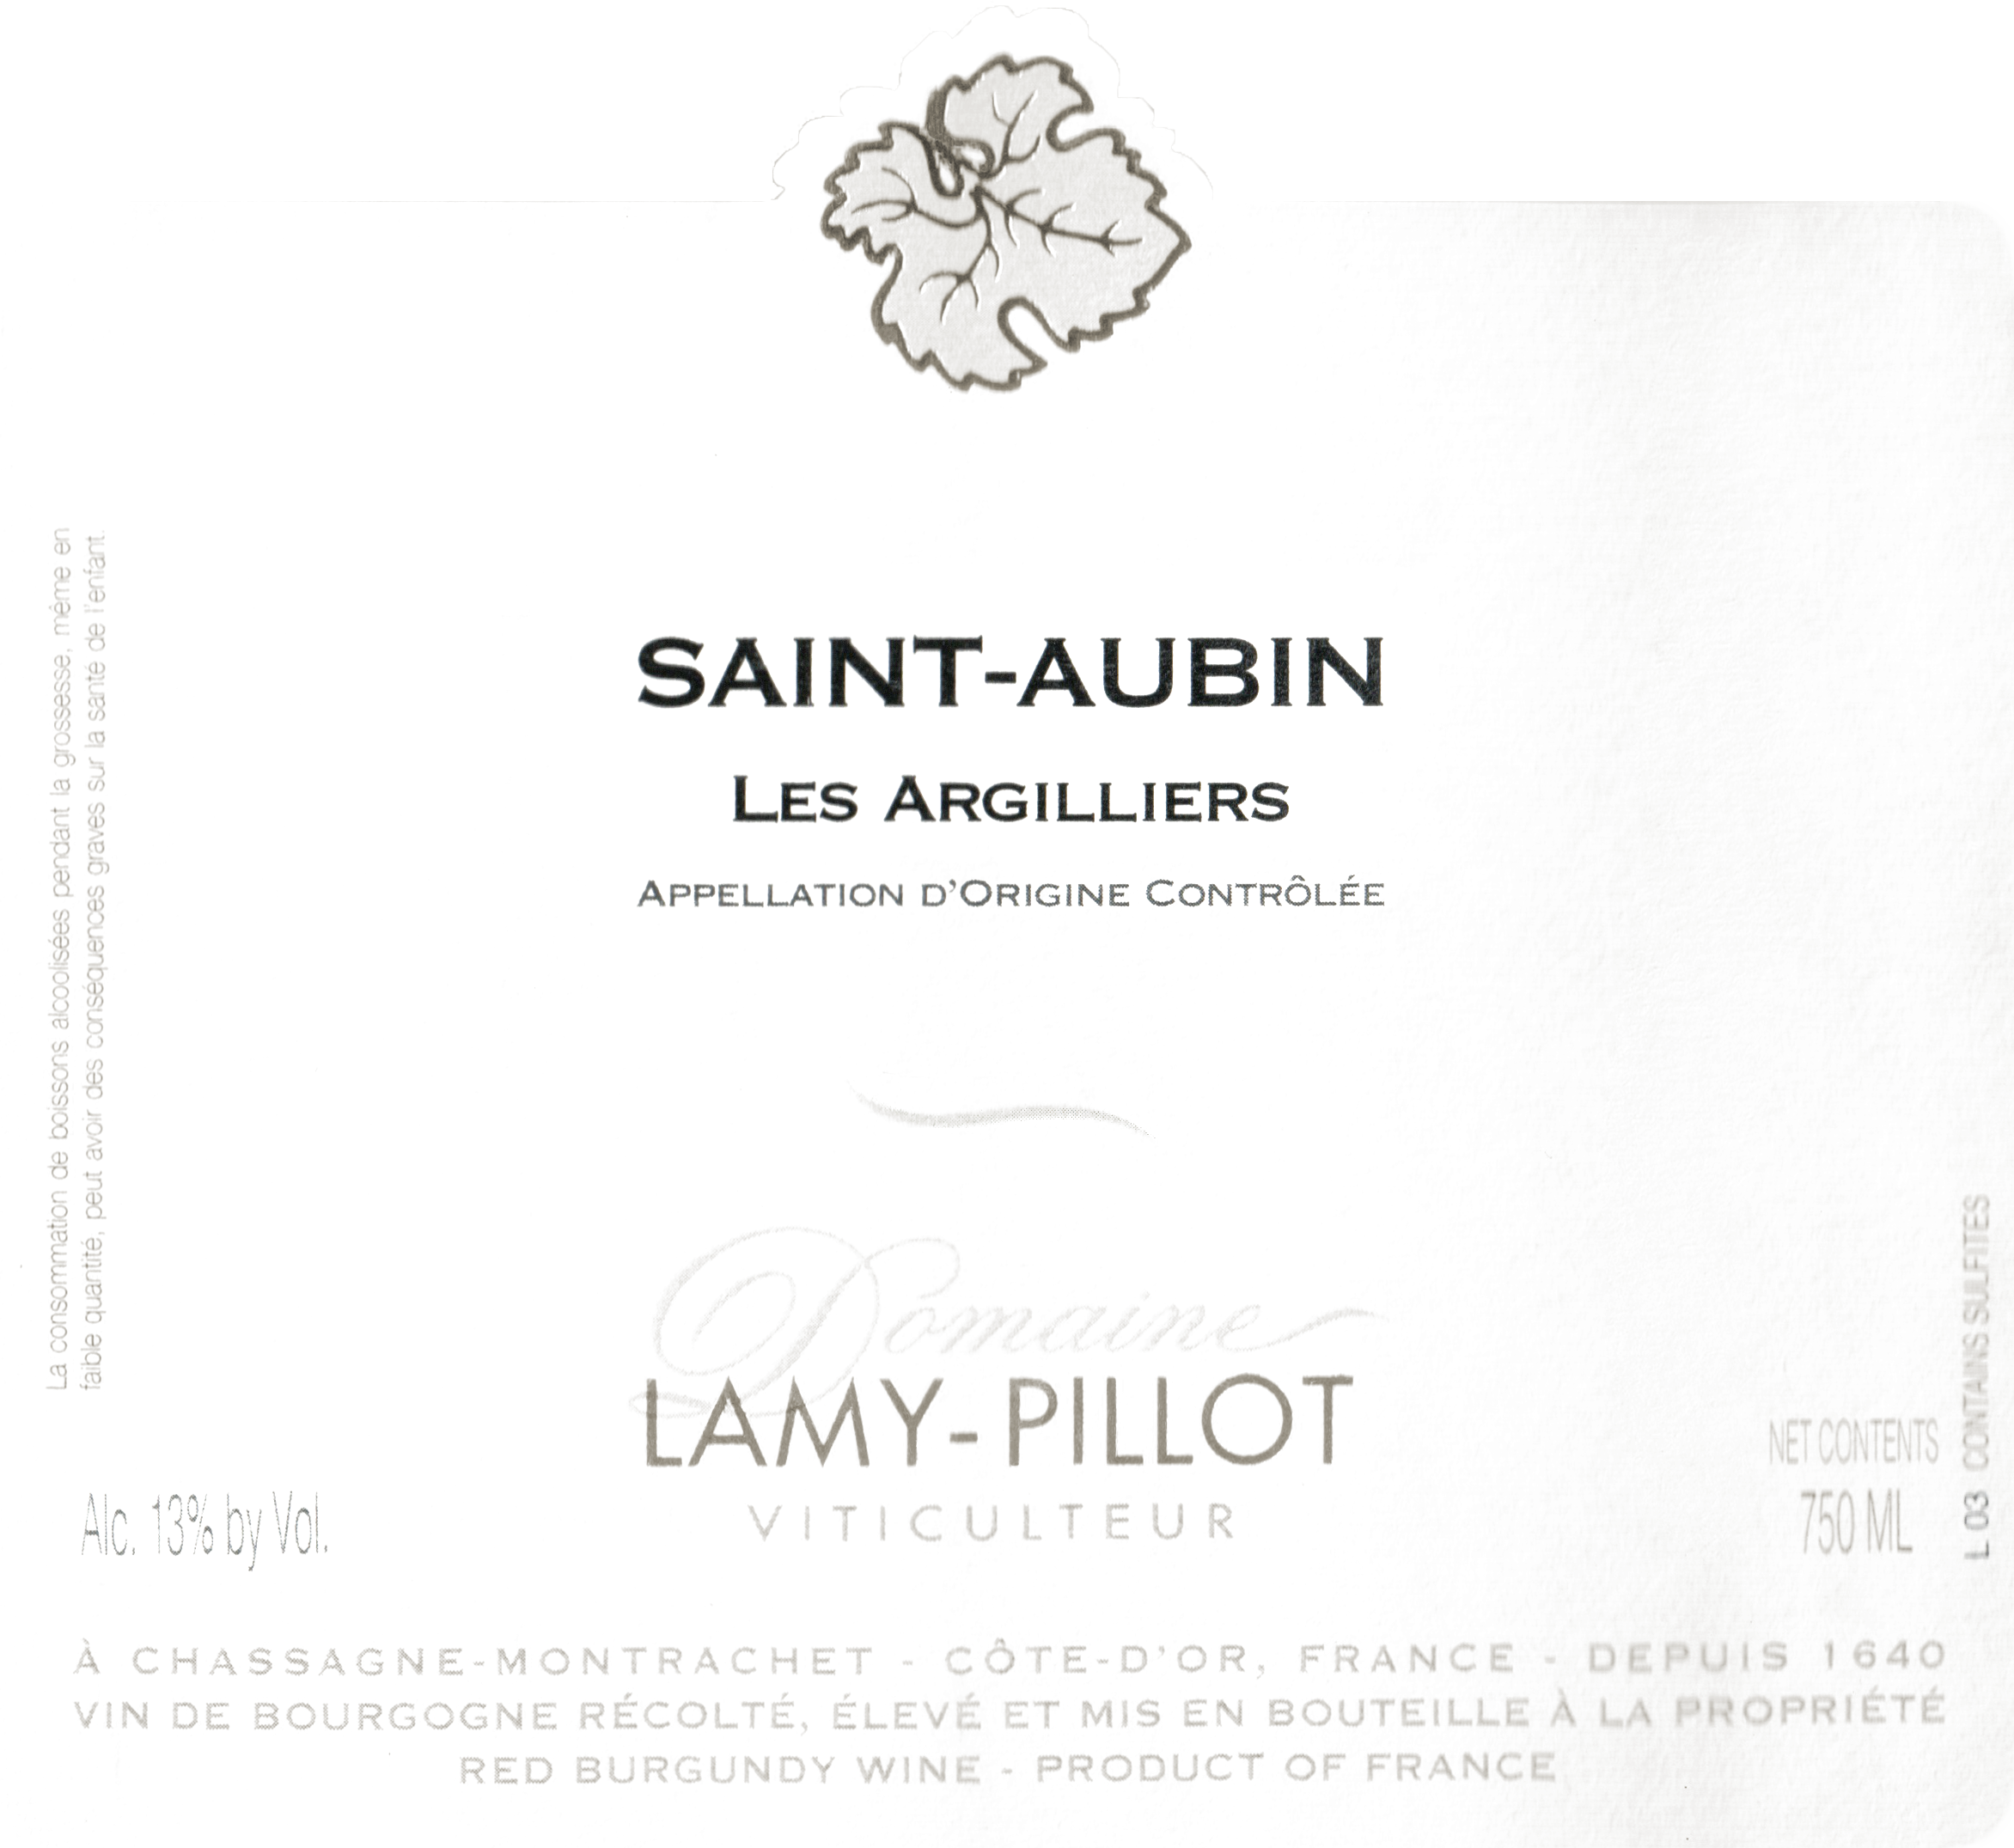 Lamy Pillot Saint Aubin Argilliers 2016